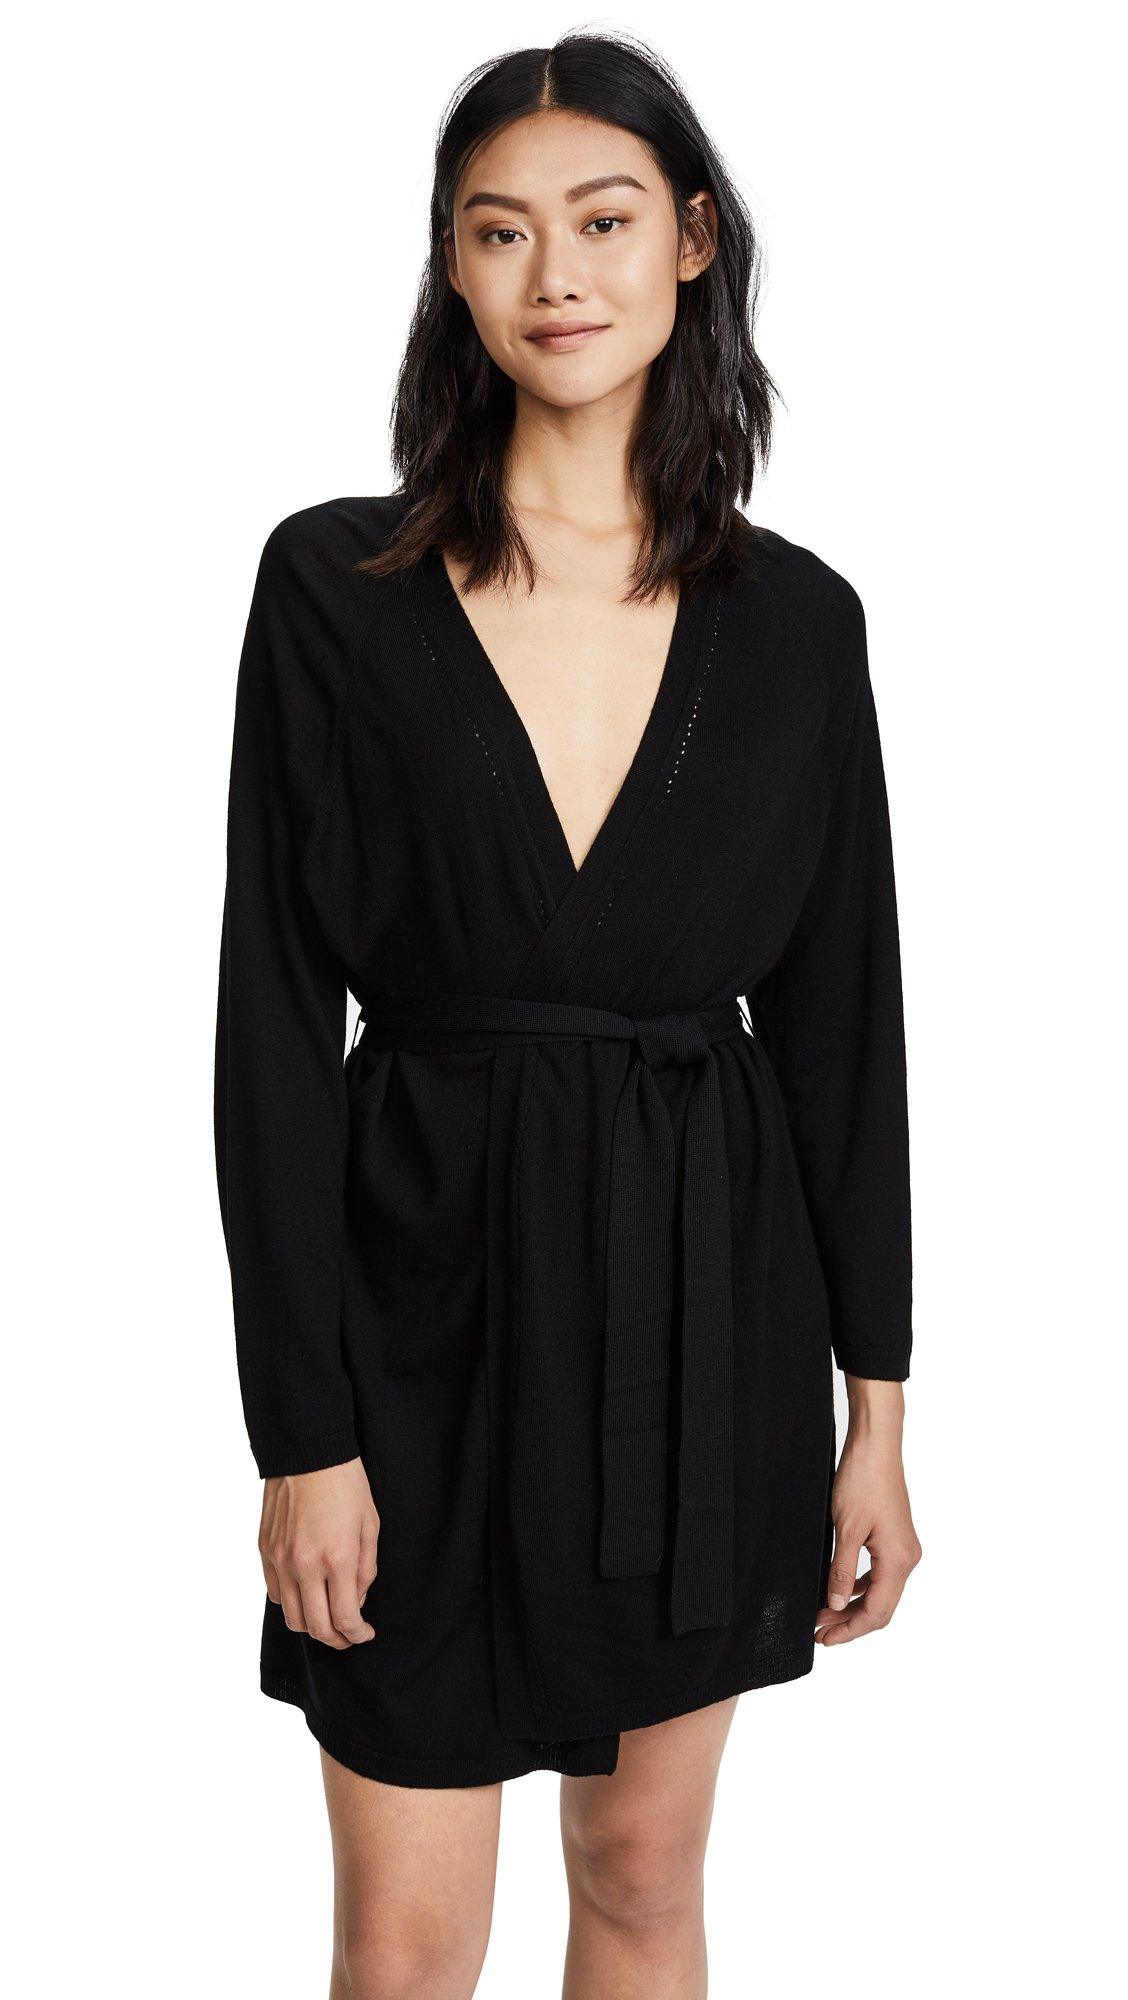 Skin Women's Mina Robe, Black, 3